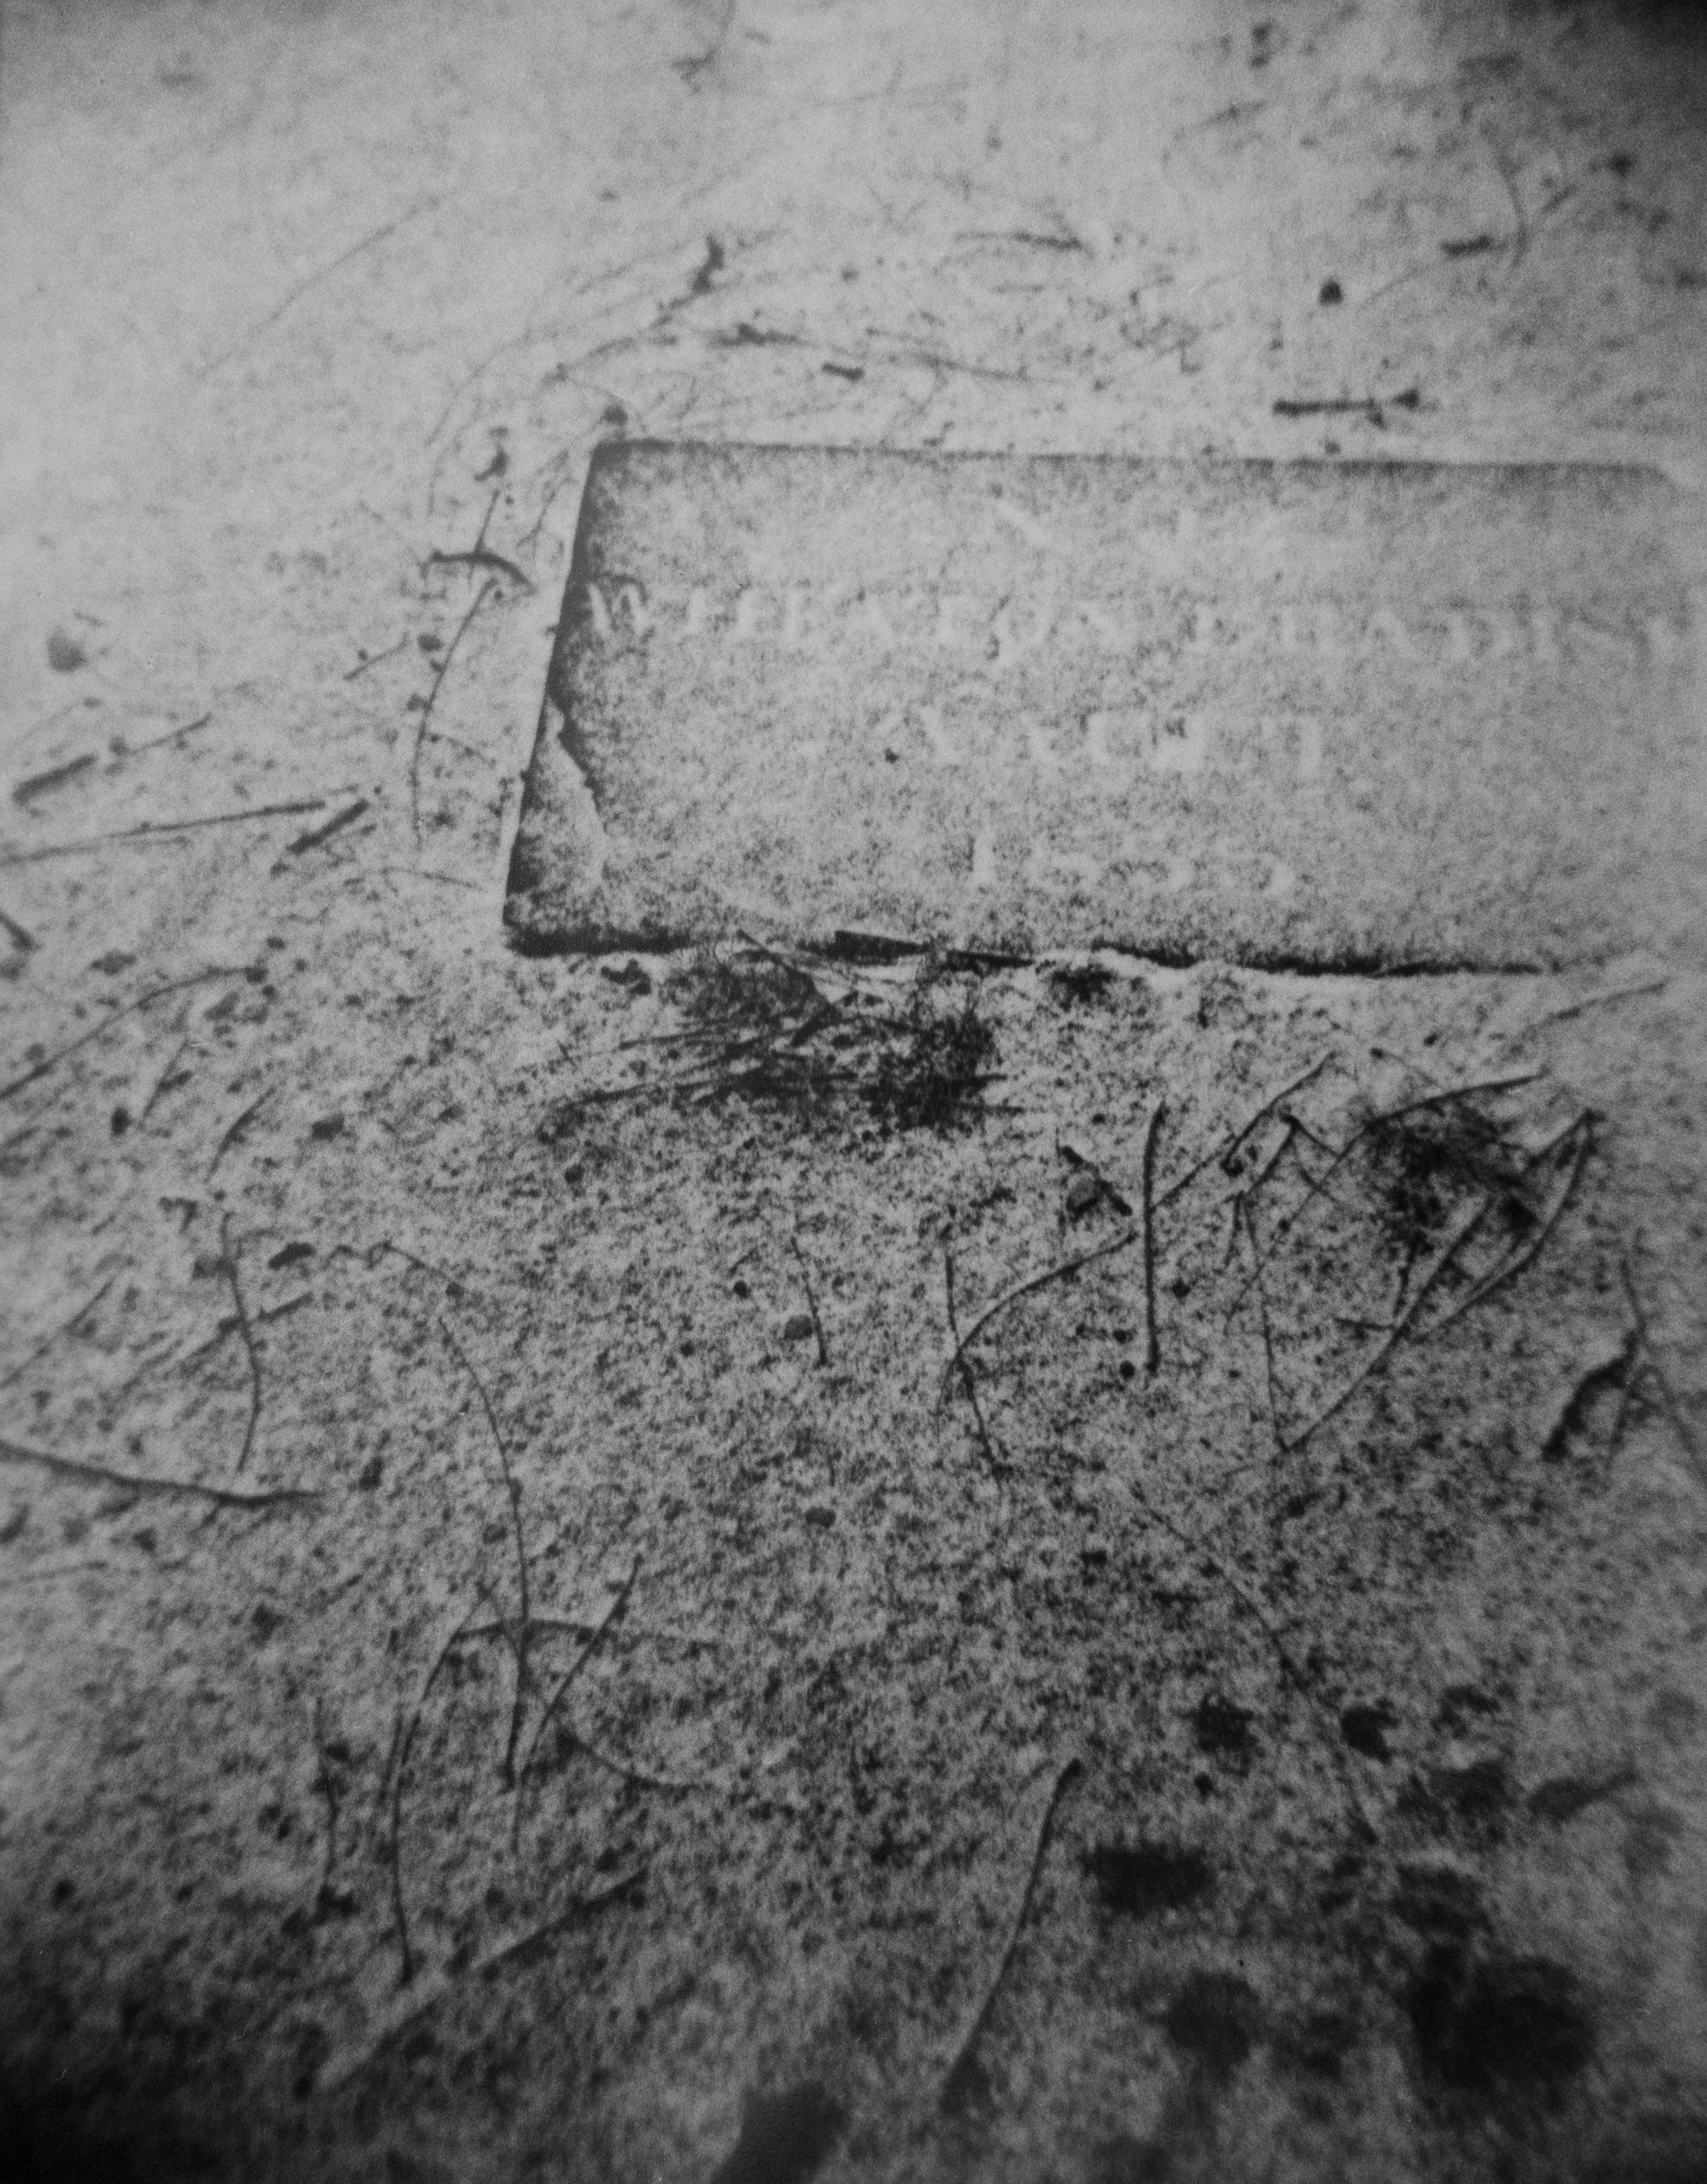 4_Grave Ground_St. Mark's Church-in-the-Bowerie, 1999-2000_.jpg